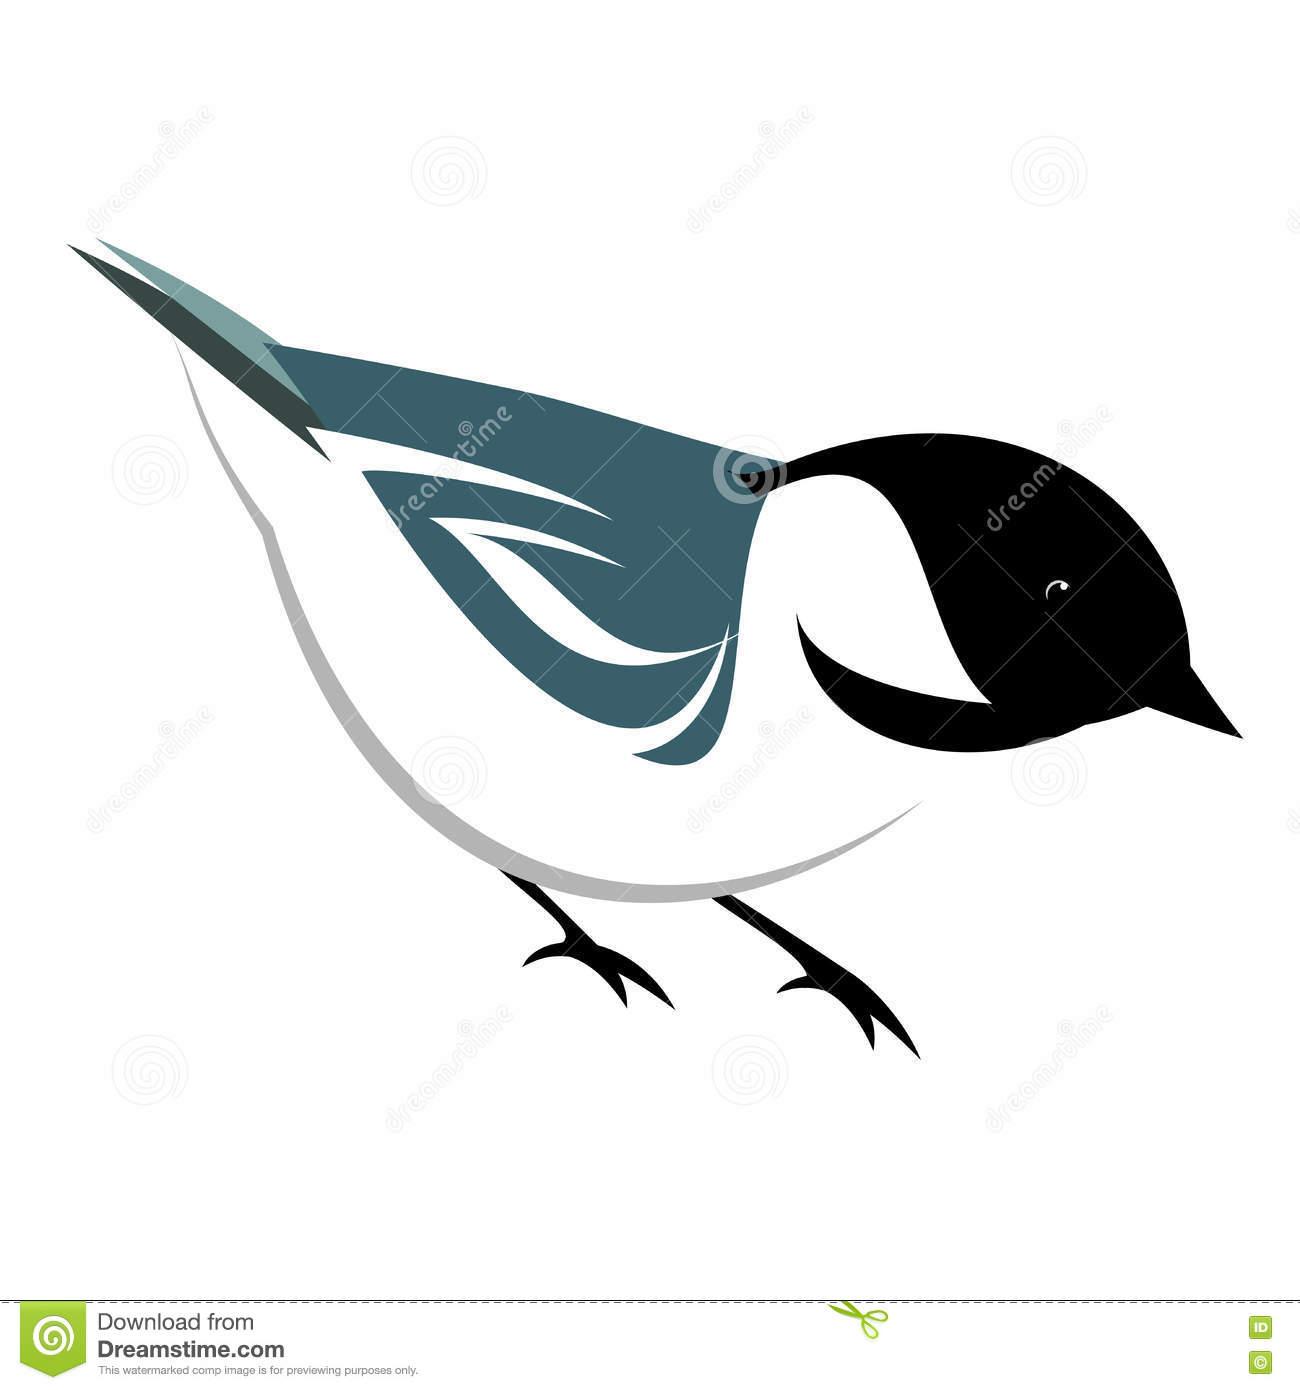 Stylized Chickadee Illustration Stock Vector.